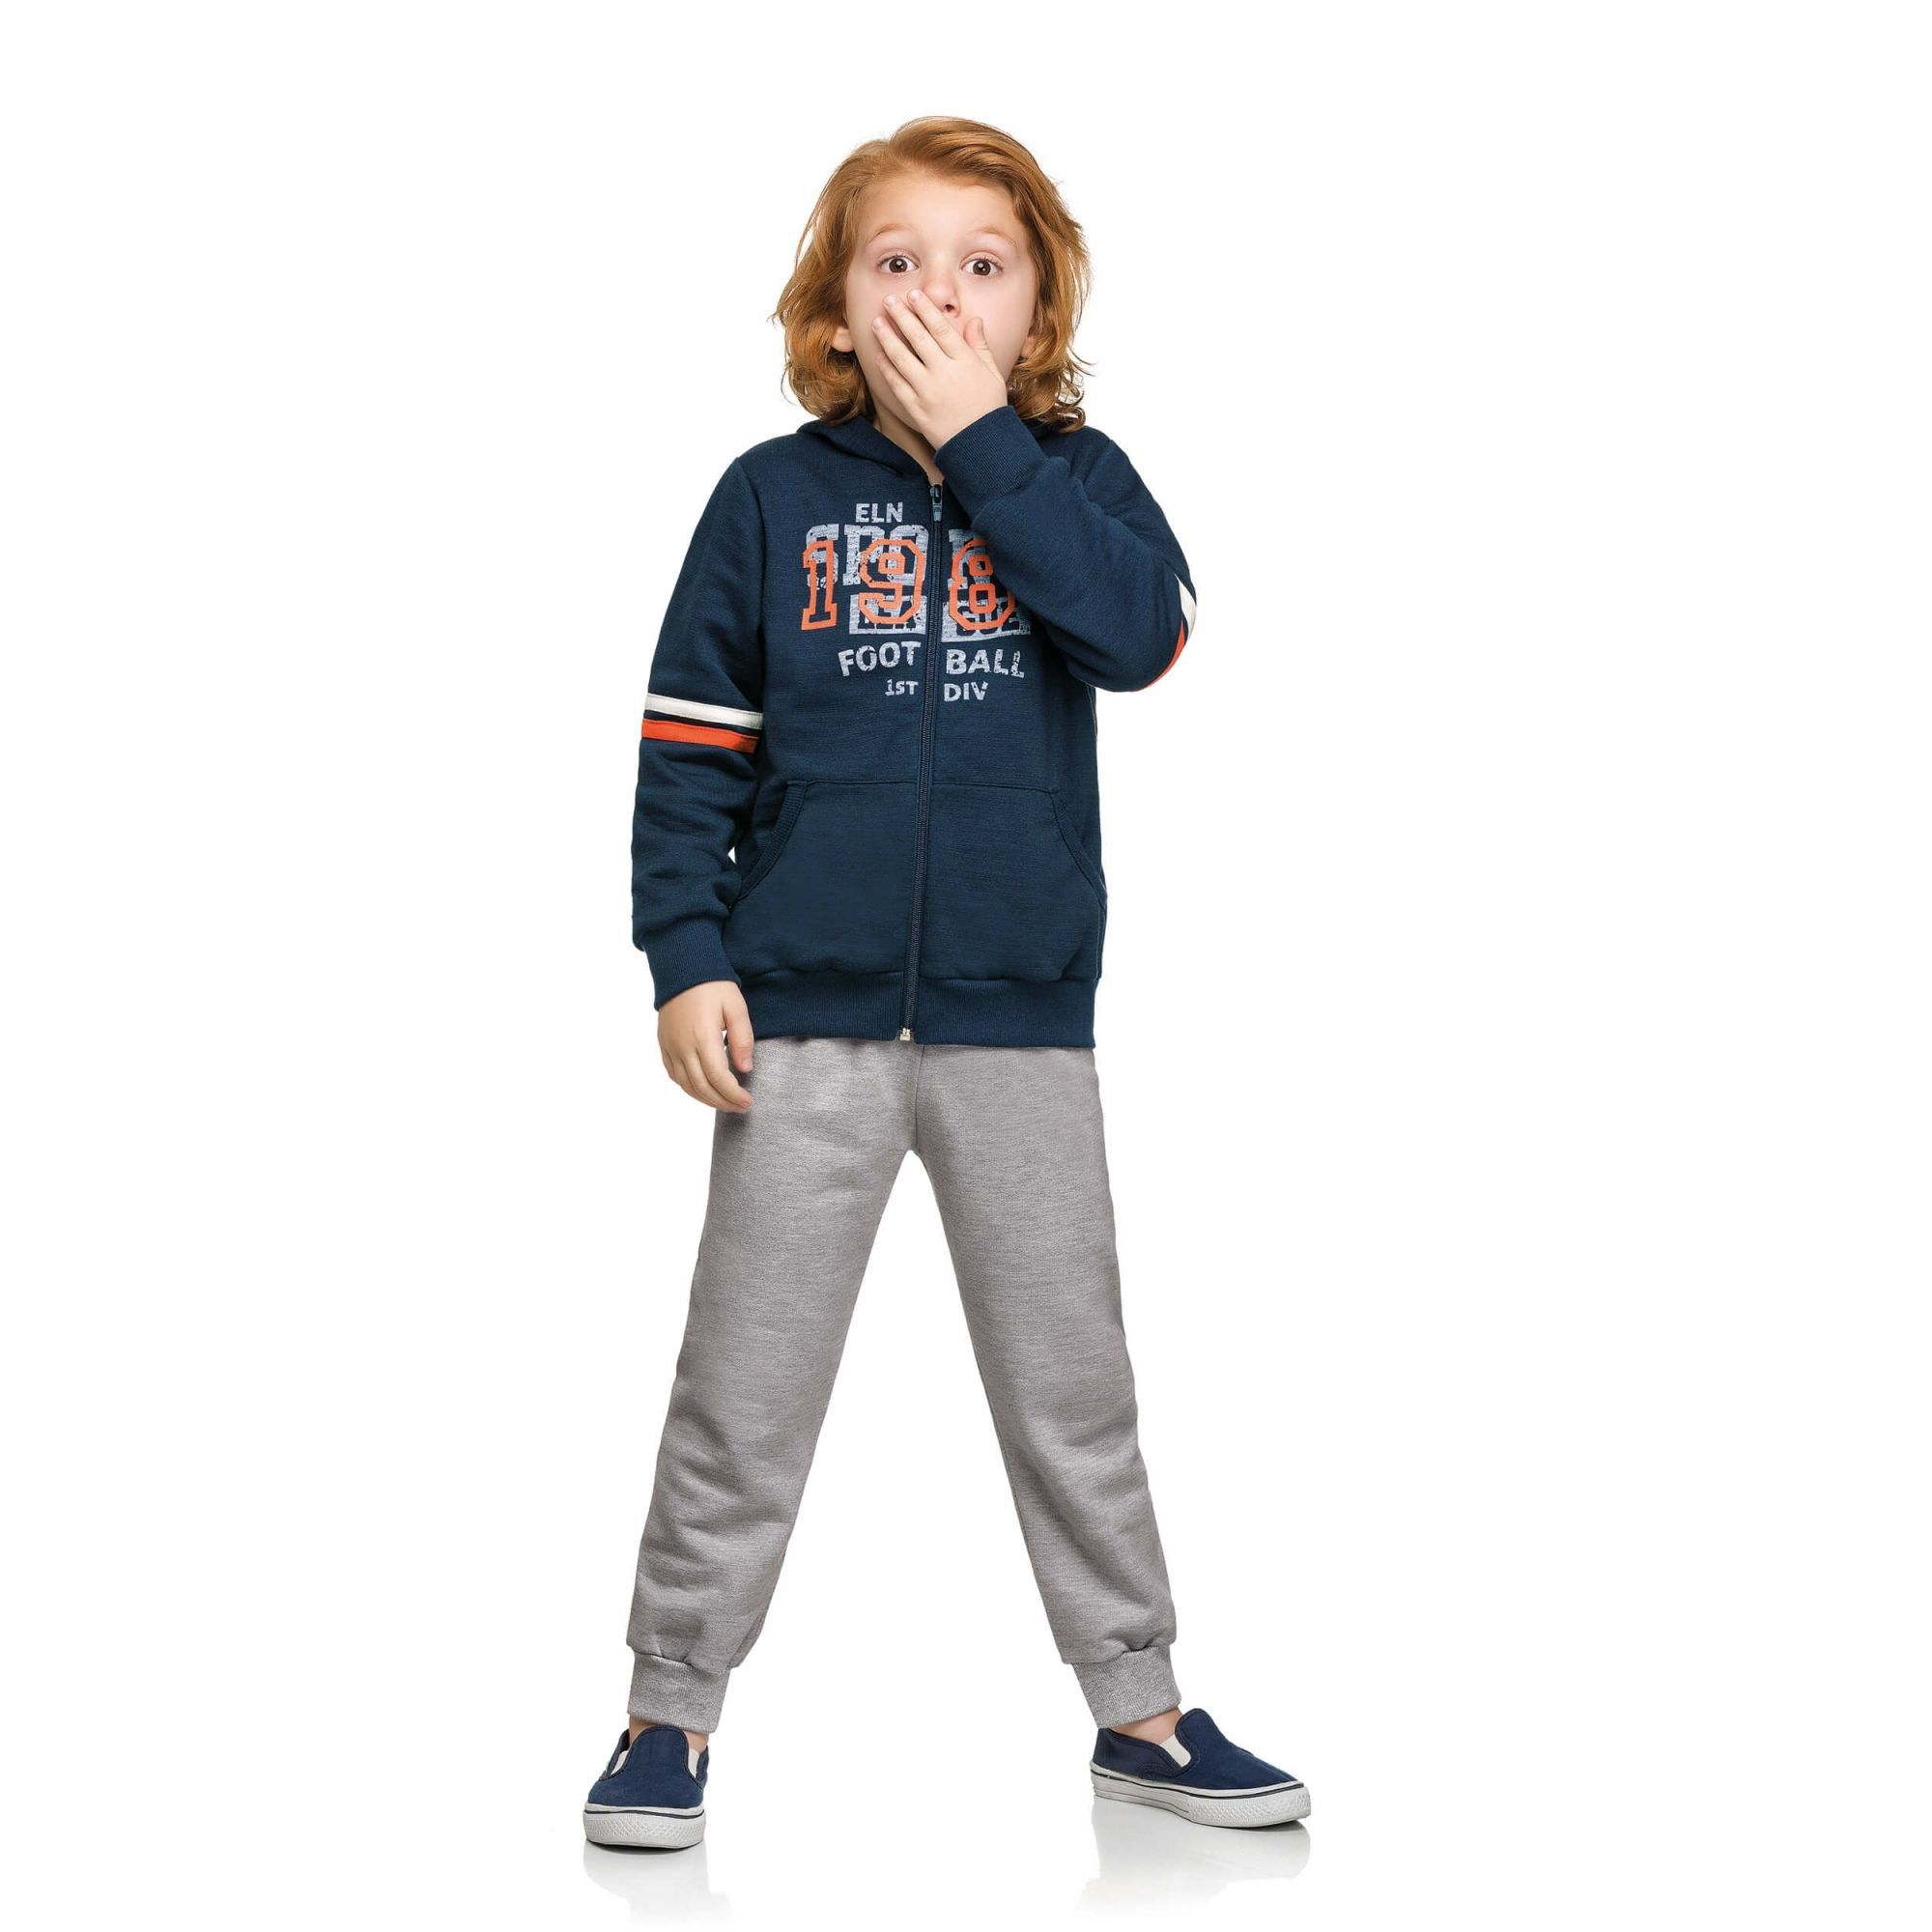 Conjunto Infantil Masculino Inverno Azul Marinho Foot Ball Elian